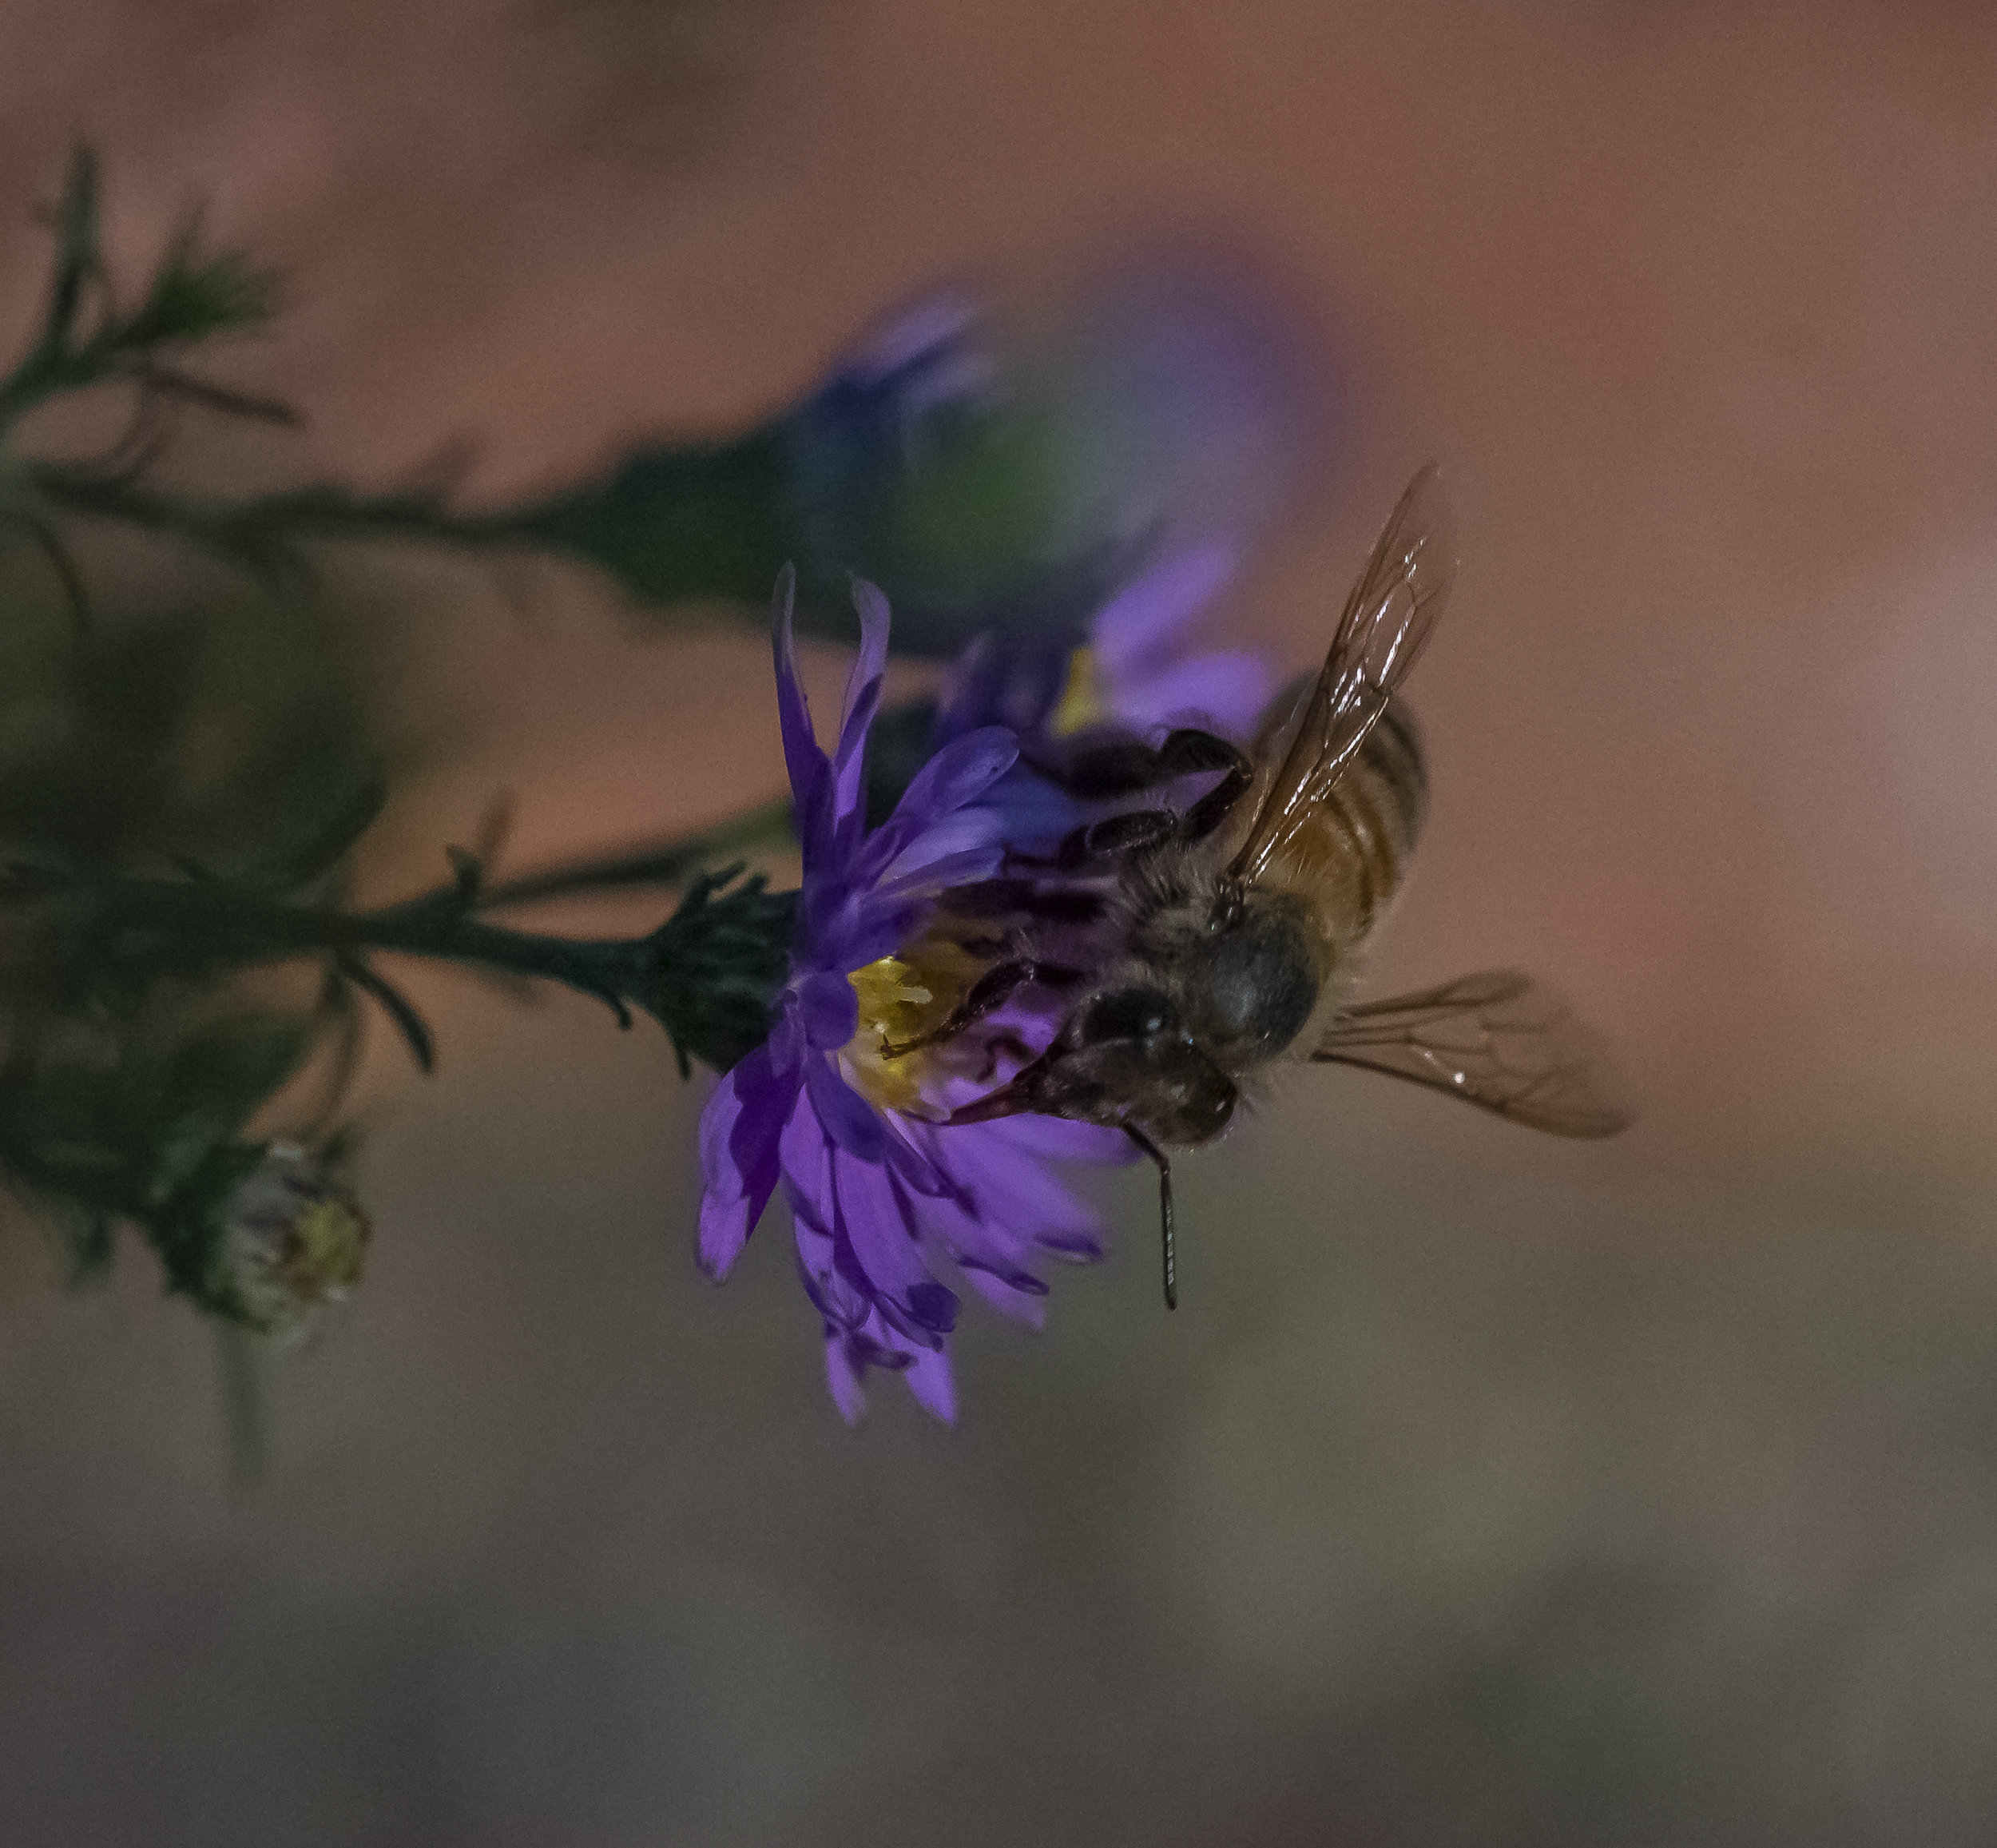 Bee in Purple Flowers in San Jose, California